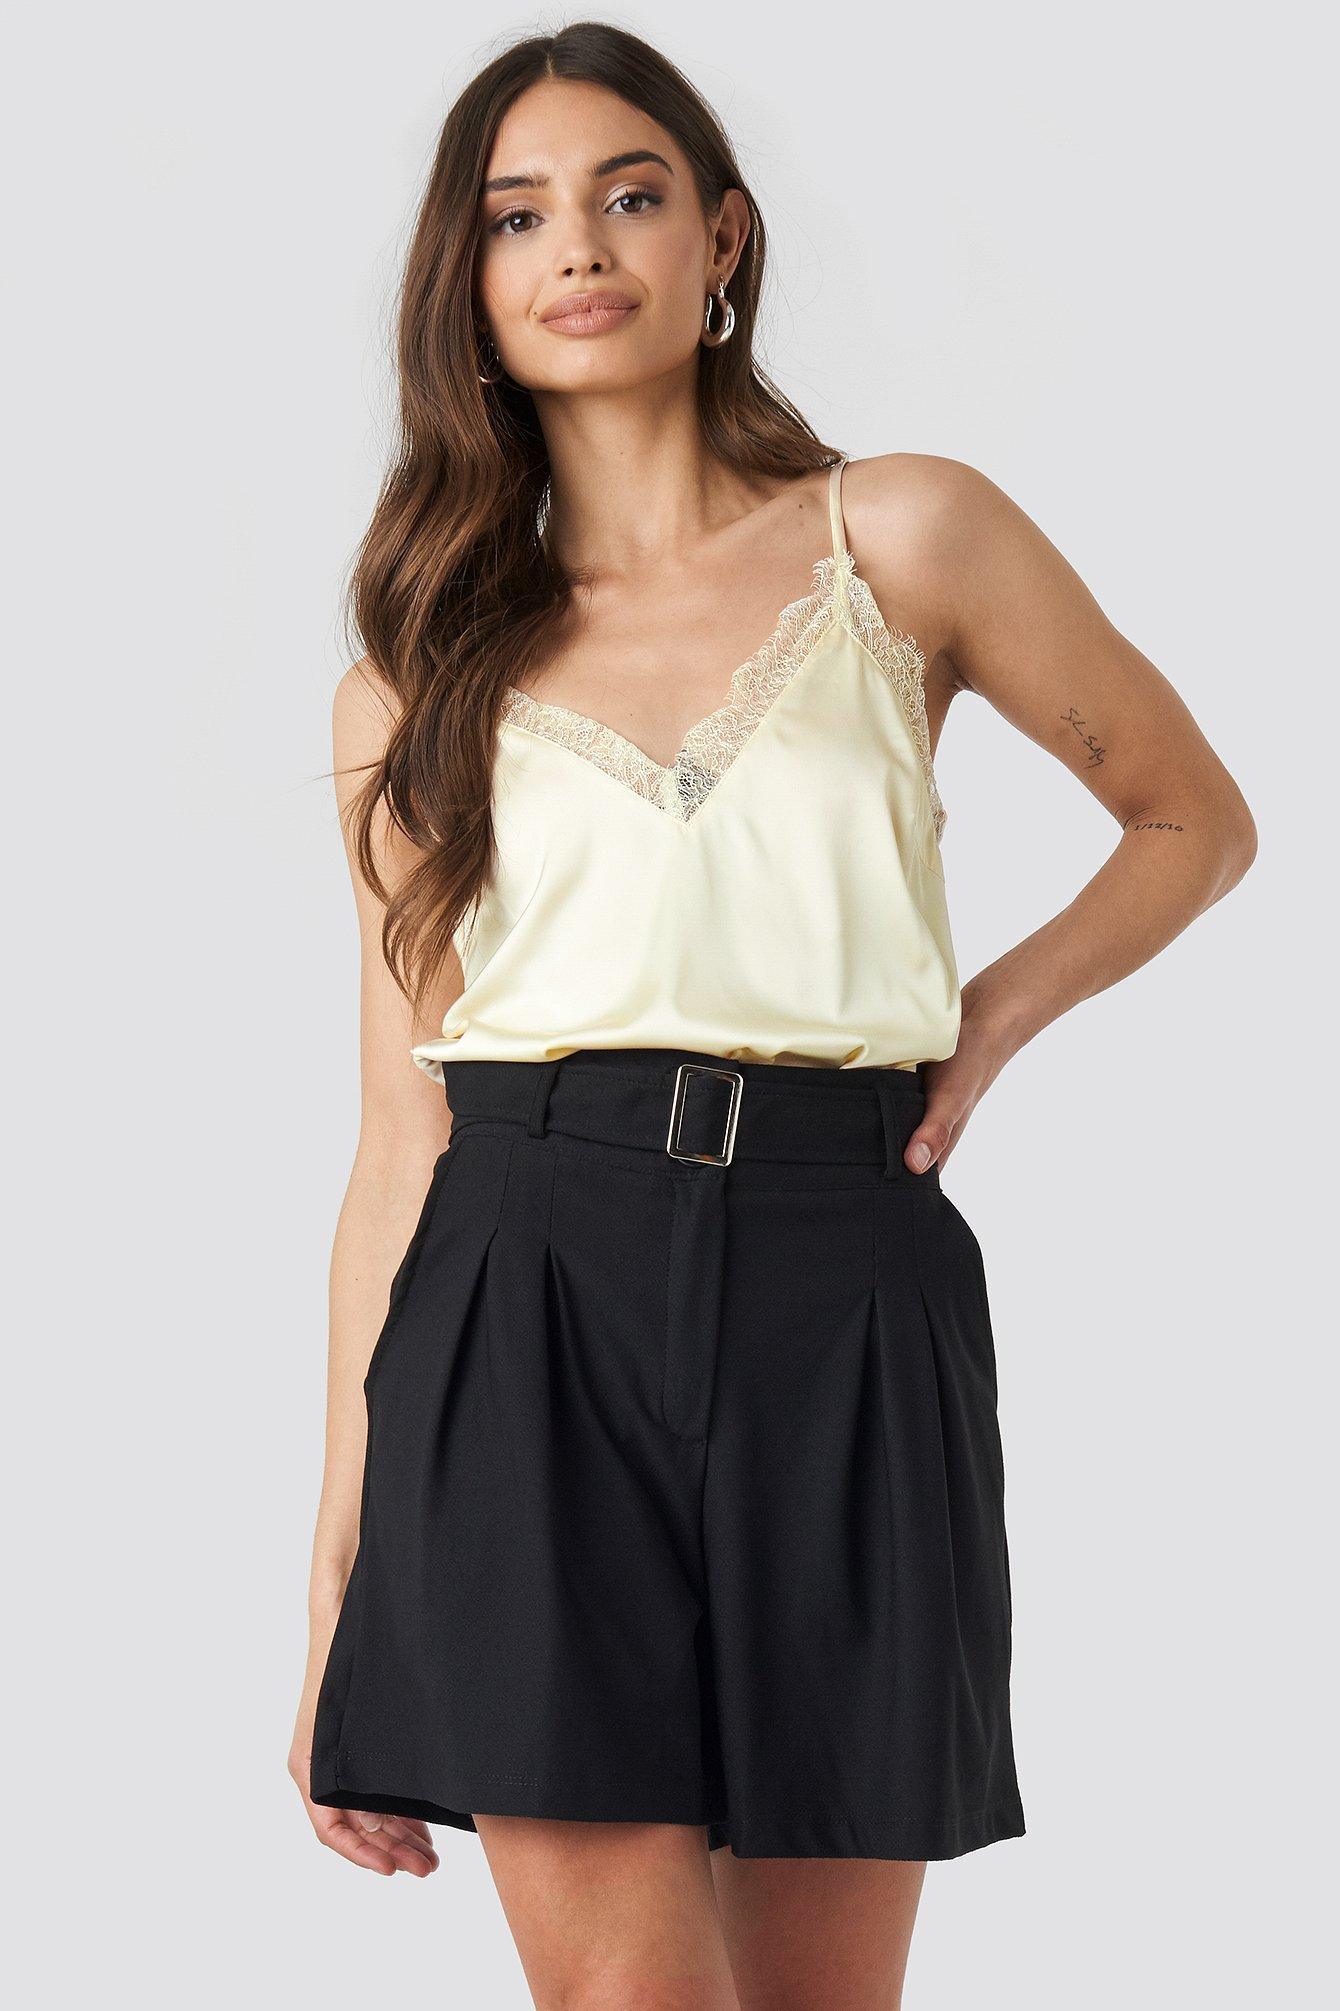 Trendyol Bora Belt Detailed Shorts - Black